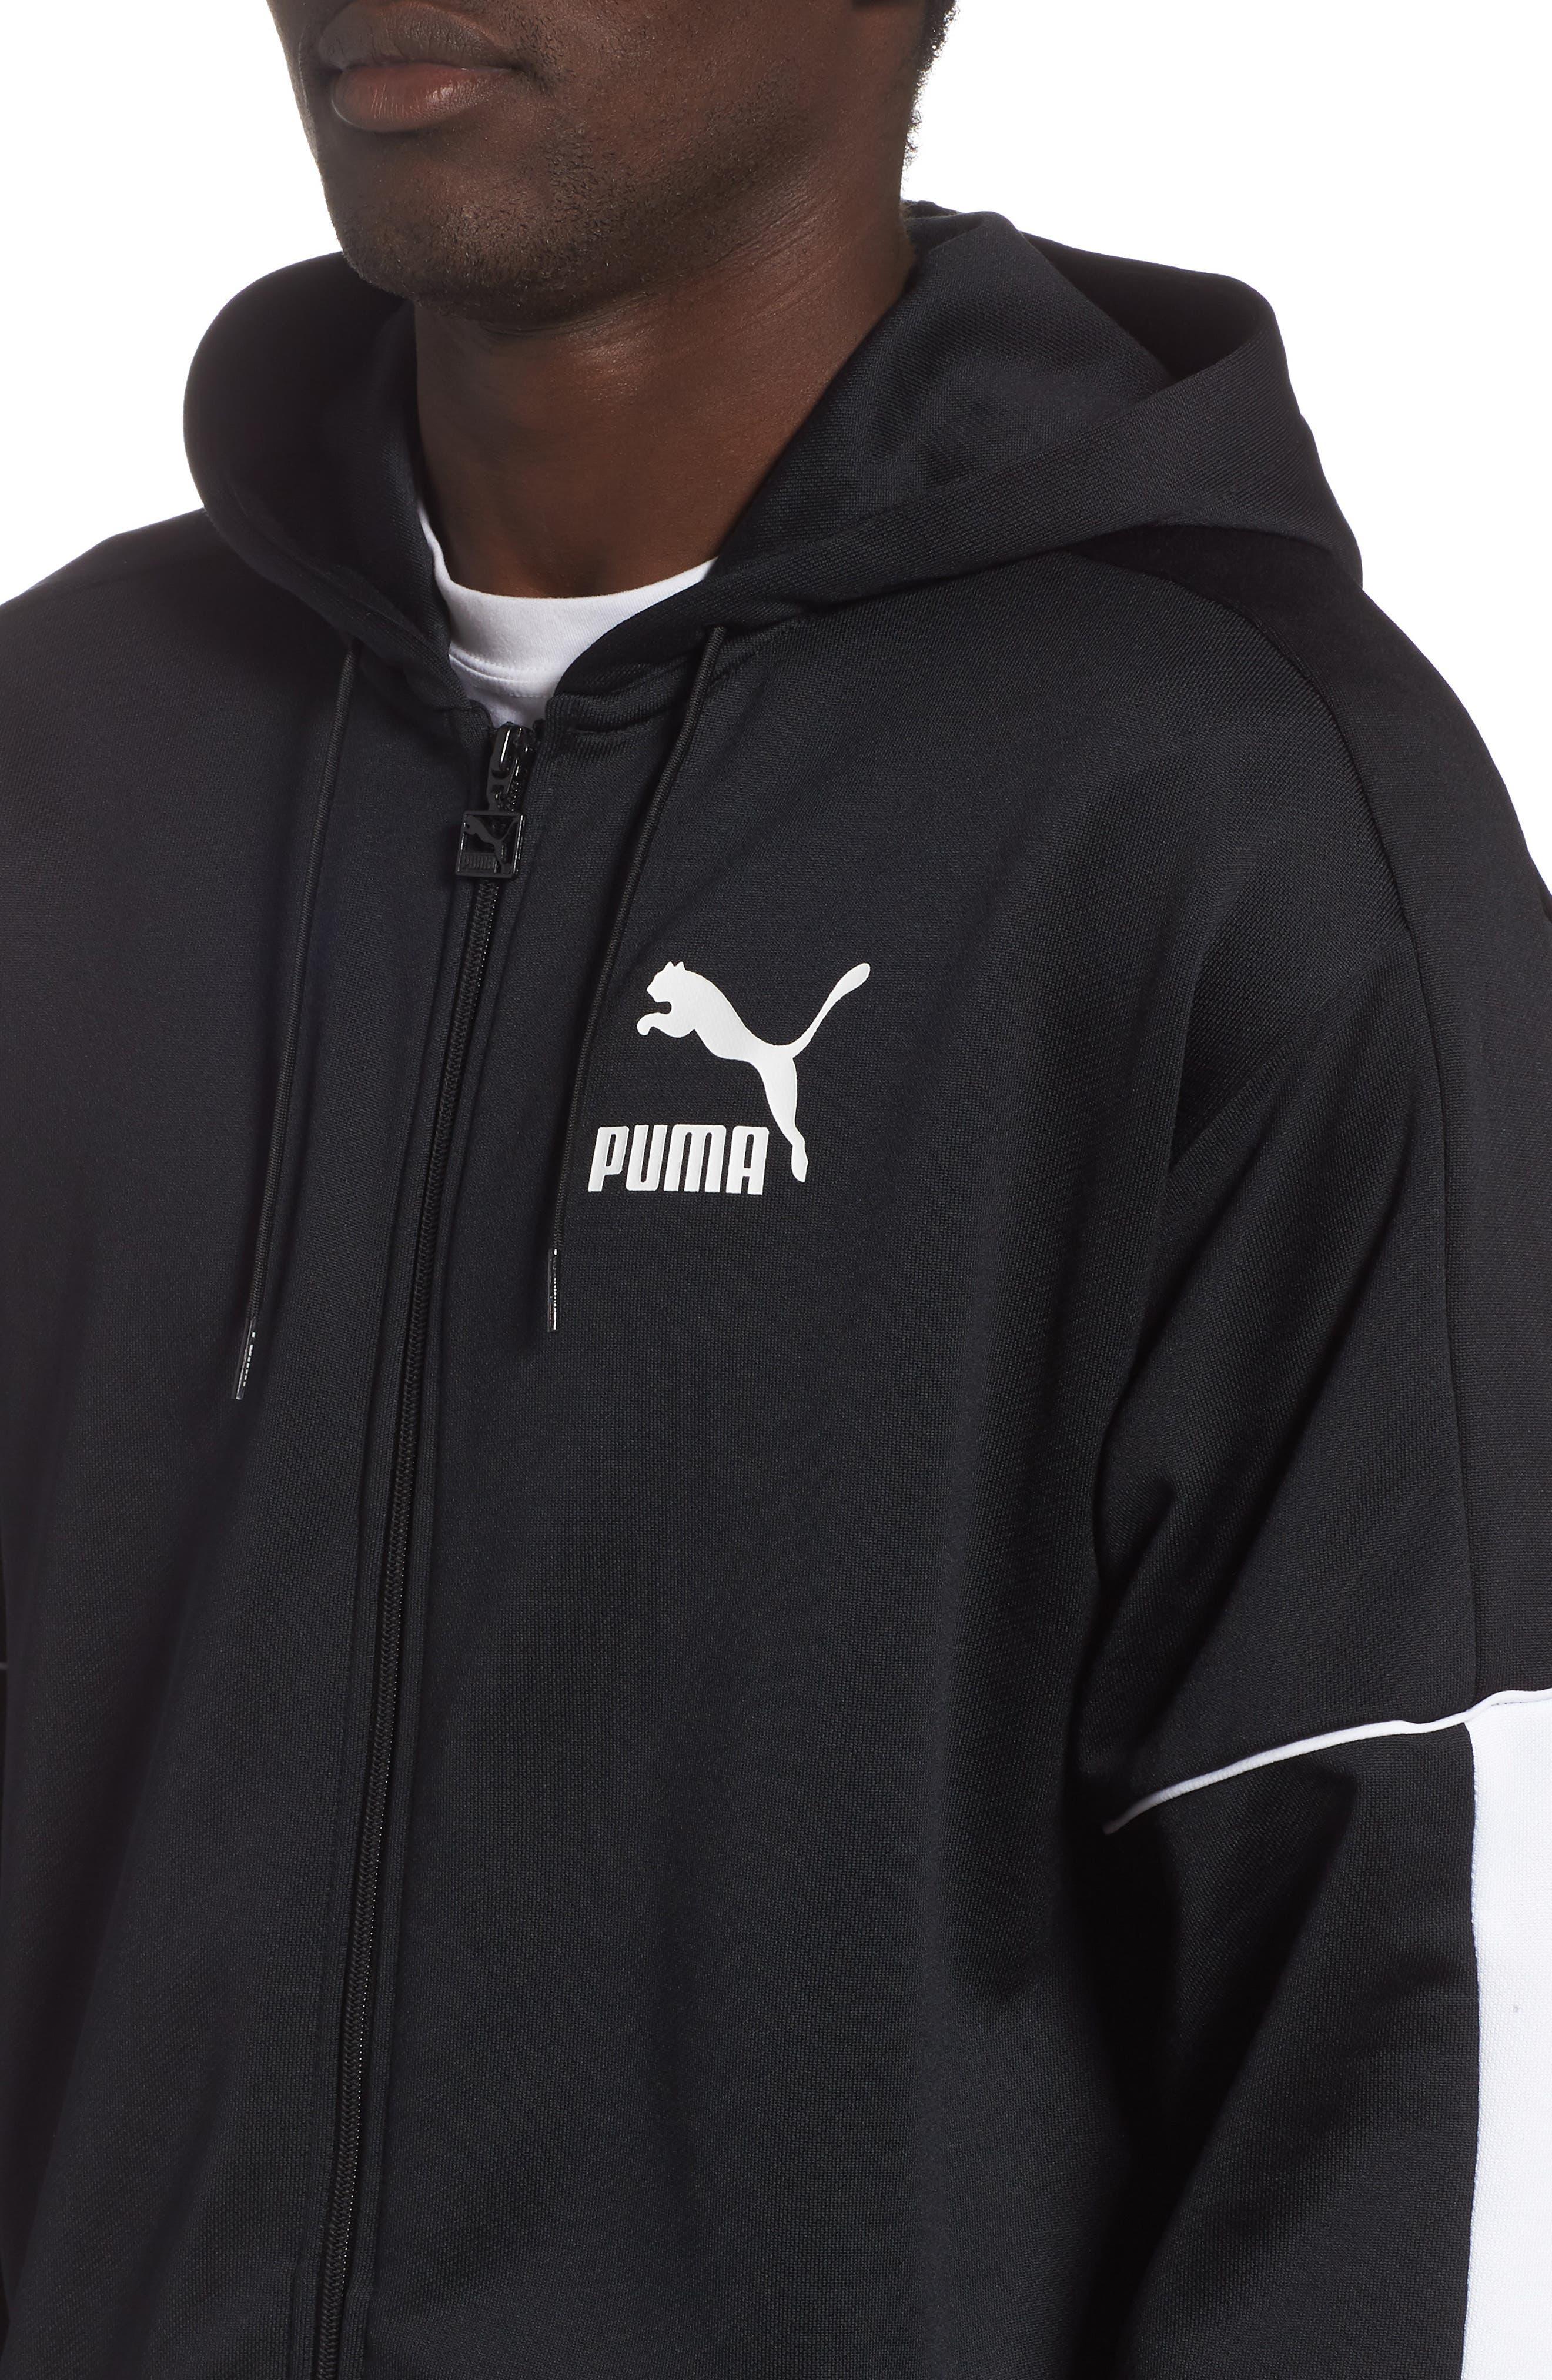 Retro Zip Hoodie Jacket,                             Alternate thumbnail 4, color,                             PUMA BLACK